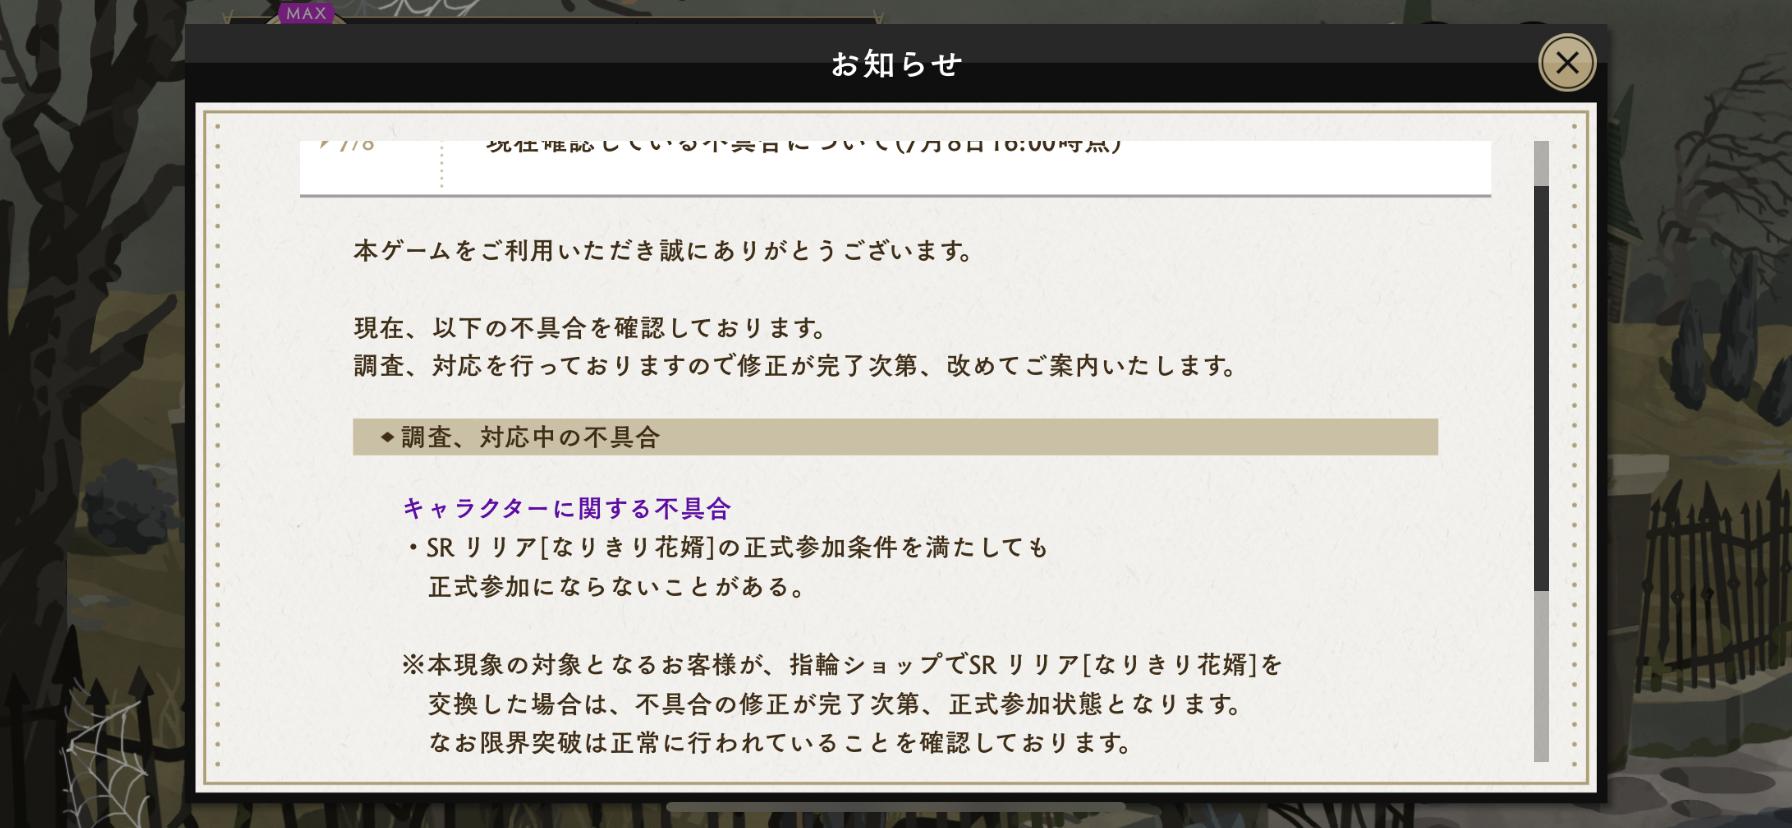 f:id:motimoti444:20210709095629p:plain